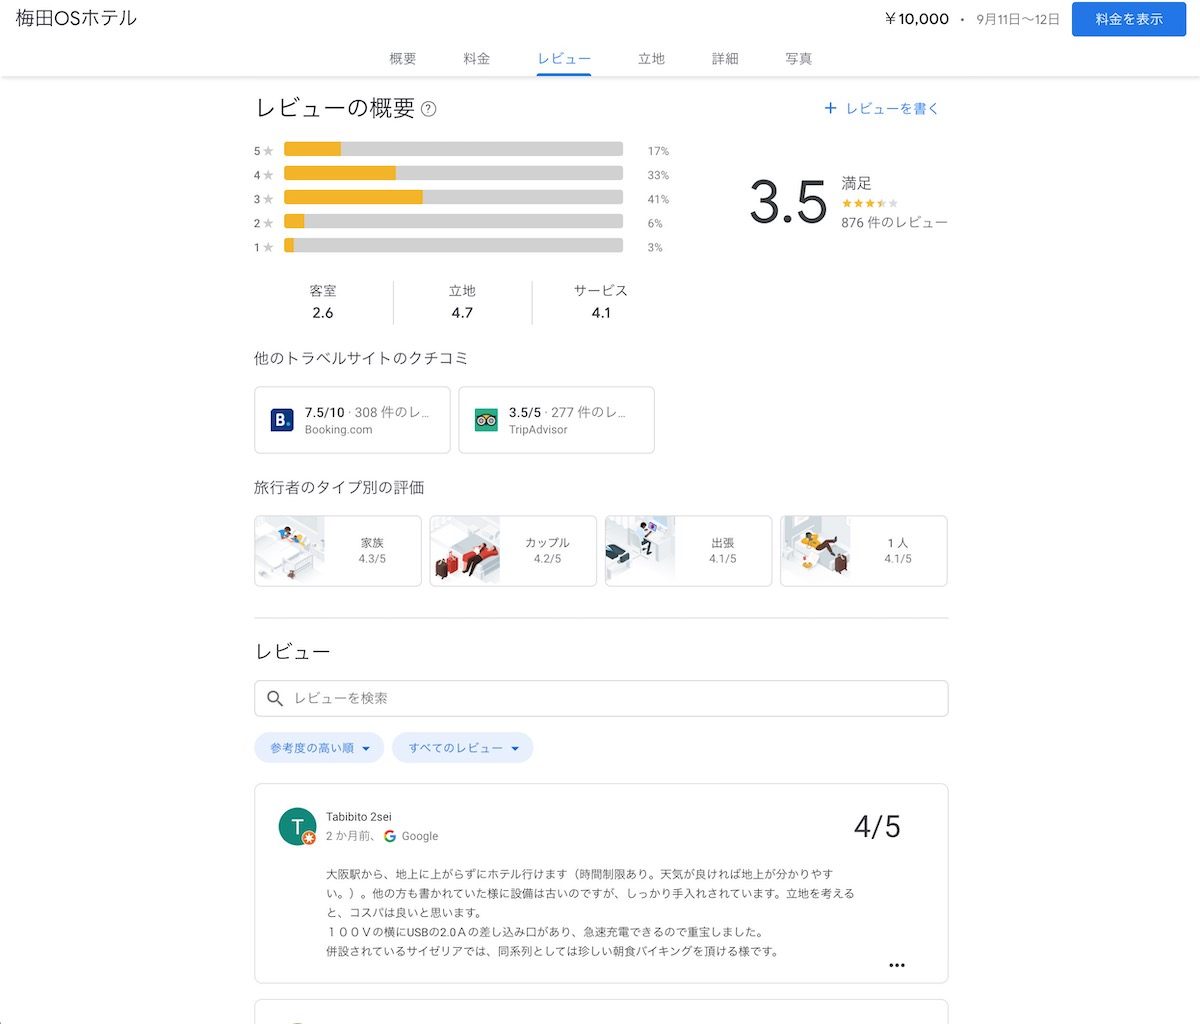 google-hotel-search_8